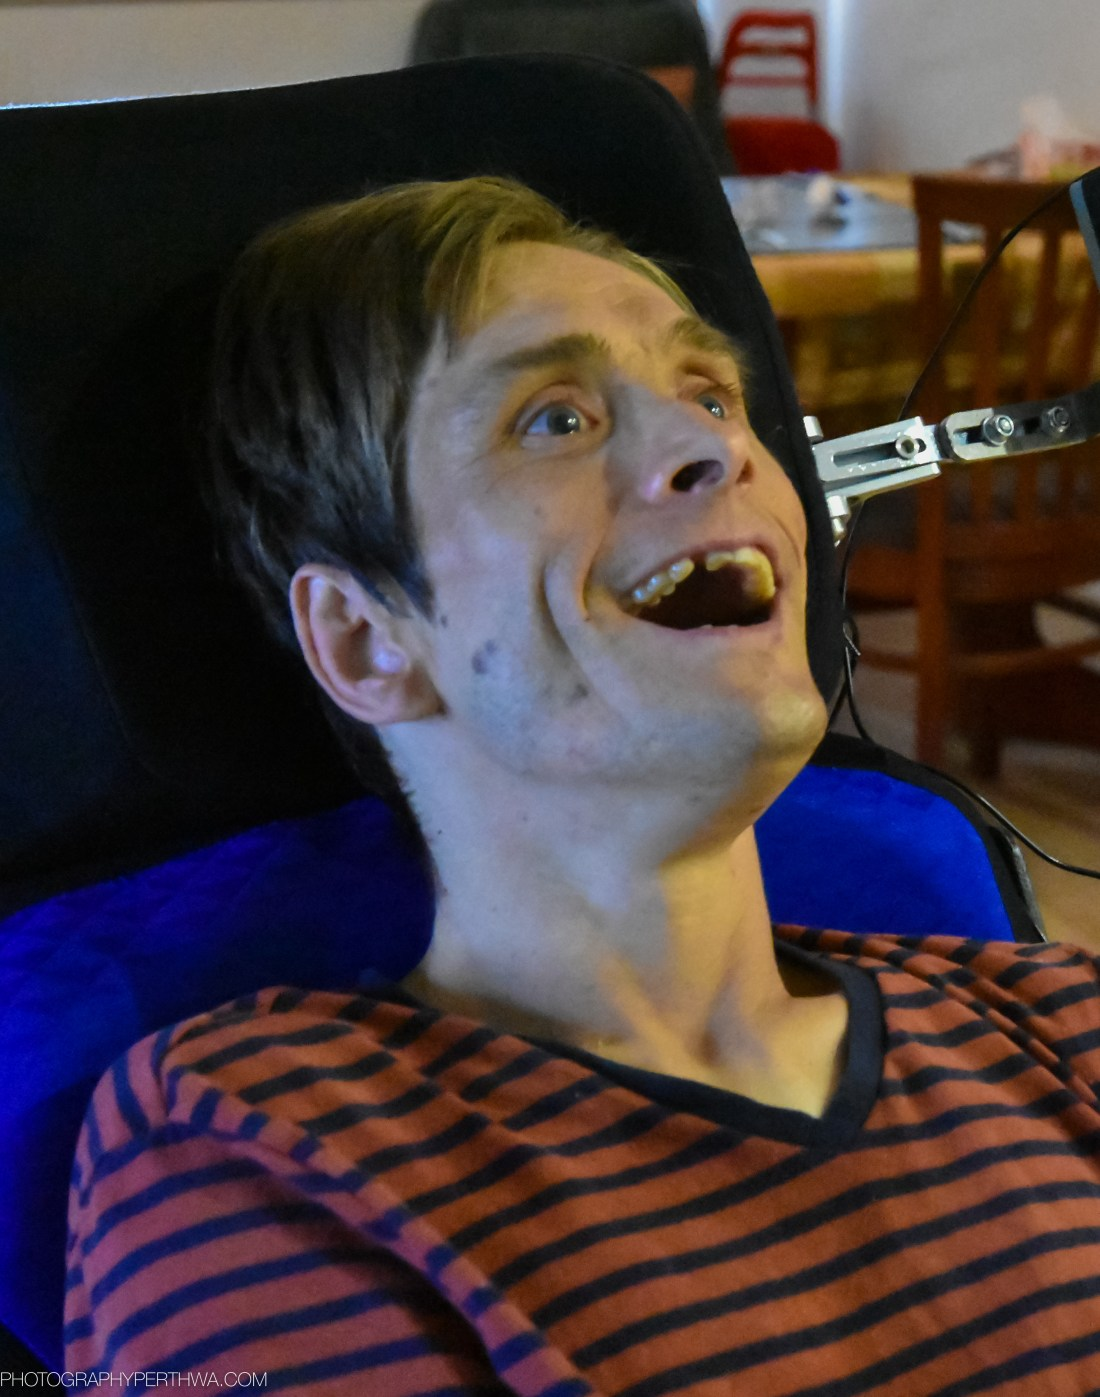 Matt smiling